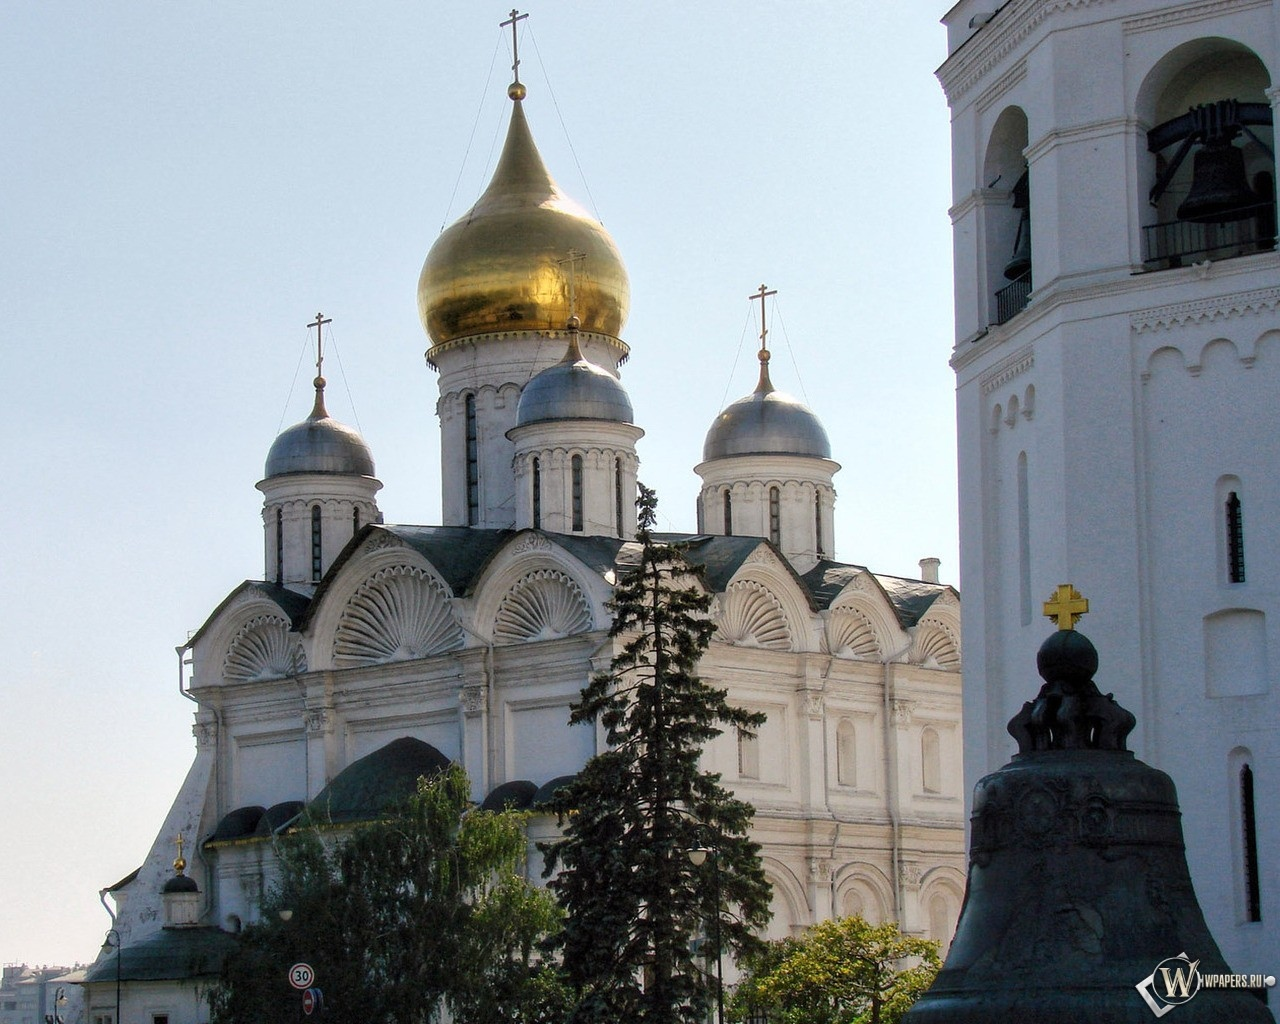 Царь-колокол (Москва) 1280x1024